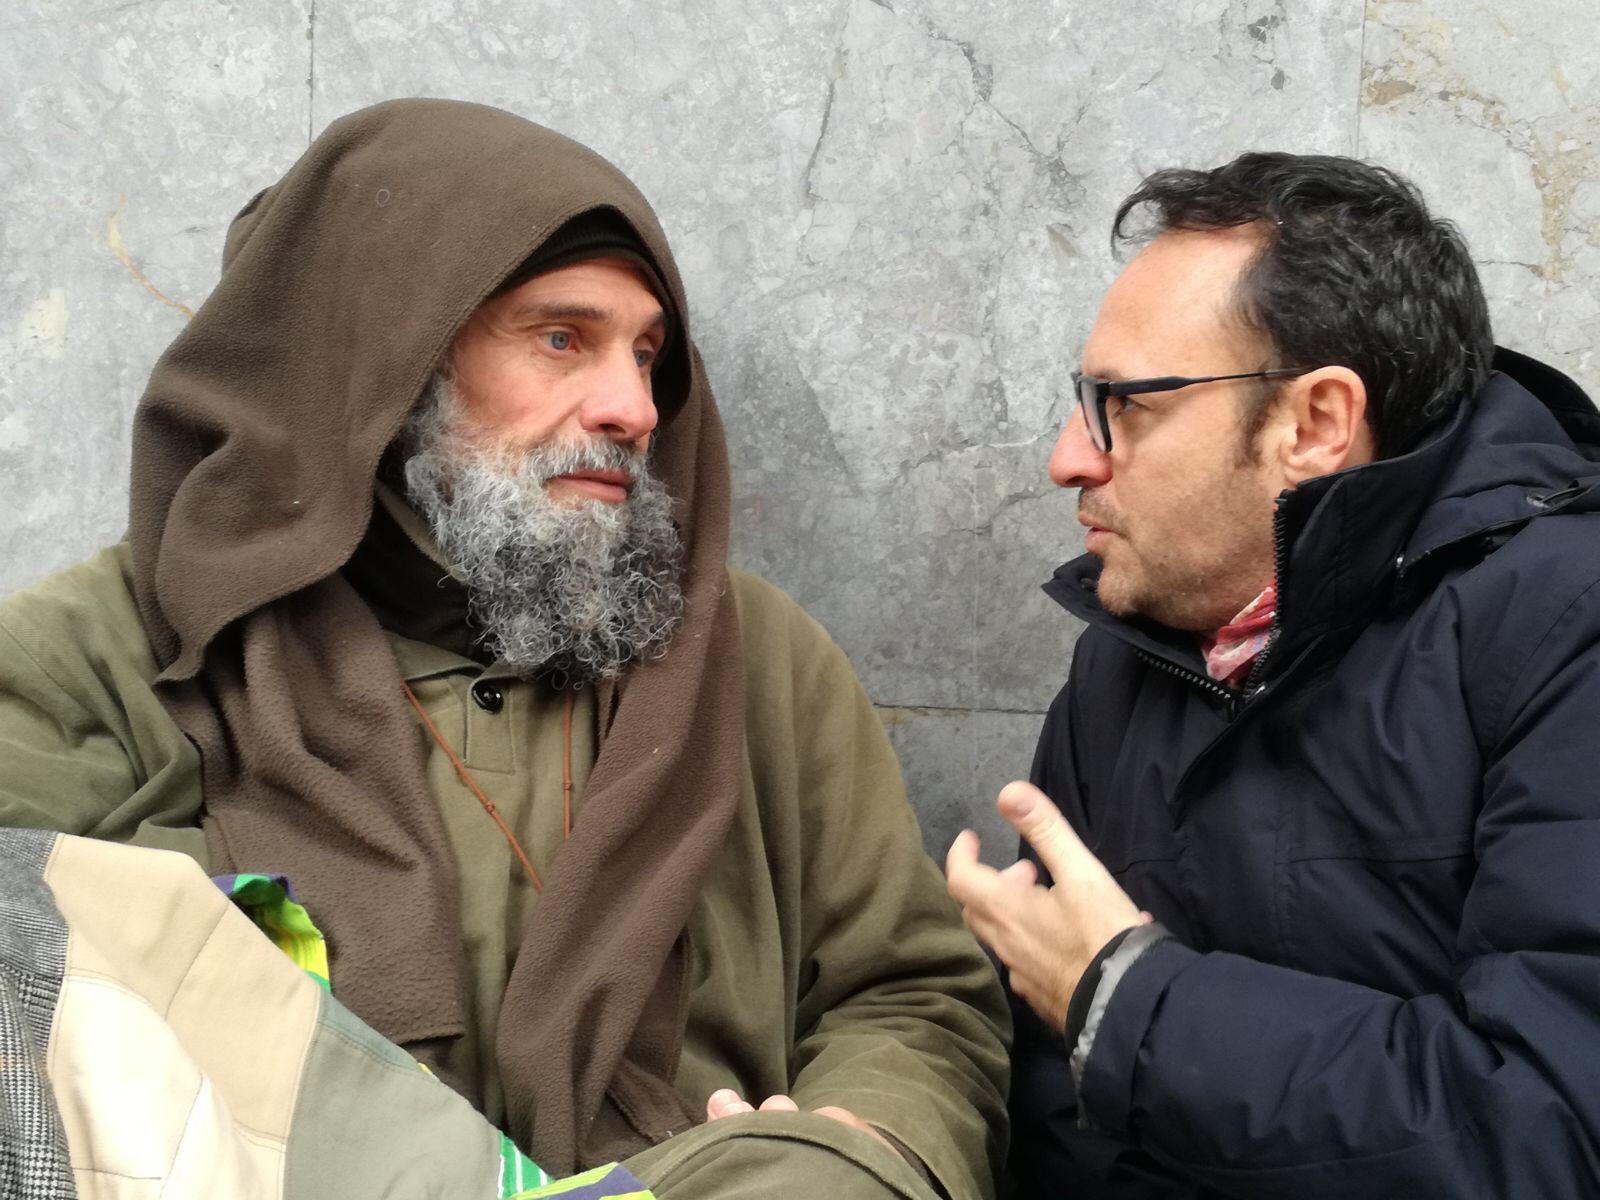 Biagio Conte protesta a Palermo per i senza casa, Musumeci lo incontra